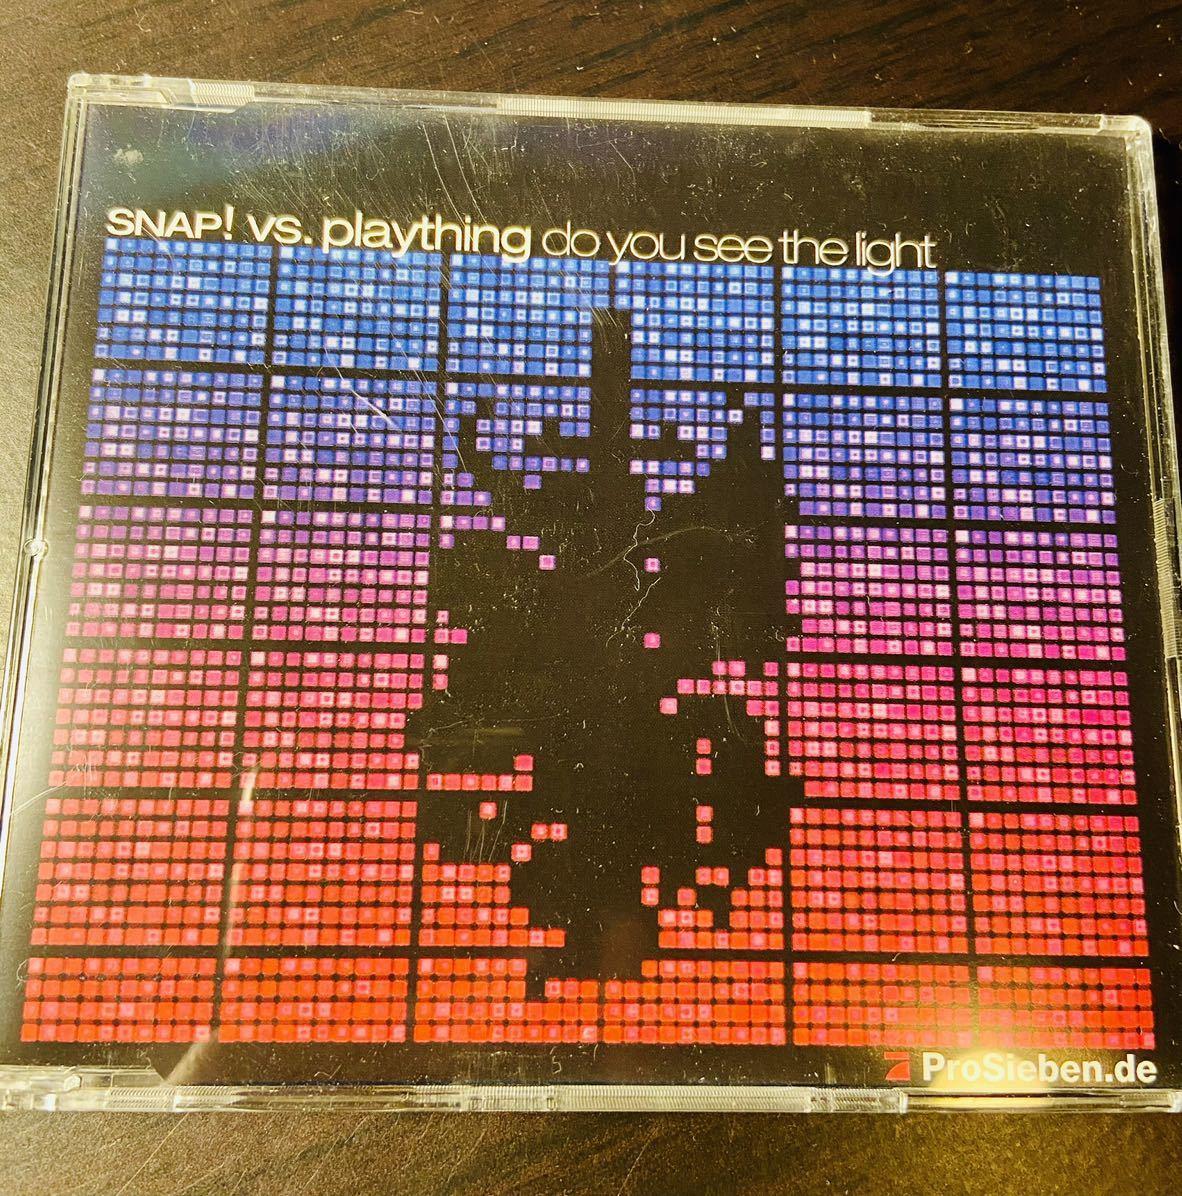 SNAP! vs. plaything do you see the light 4バージョン入シングルCD 一度のみ試聴 2002年 送料無料